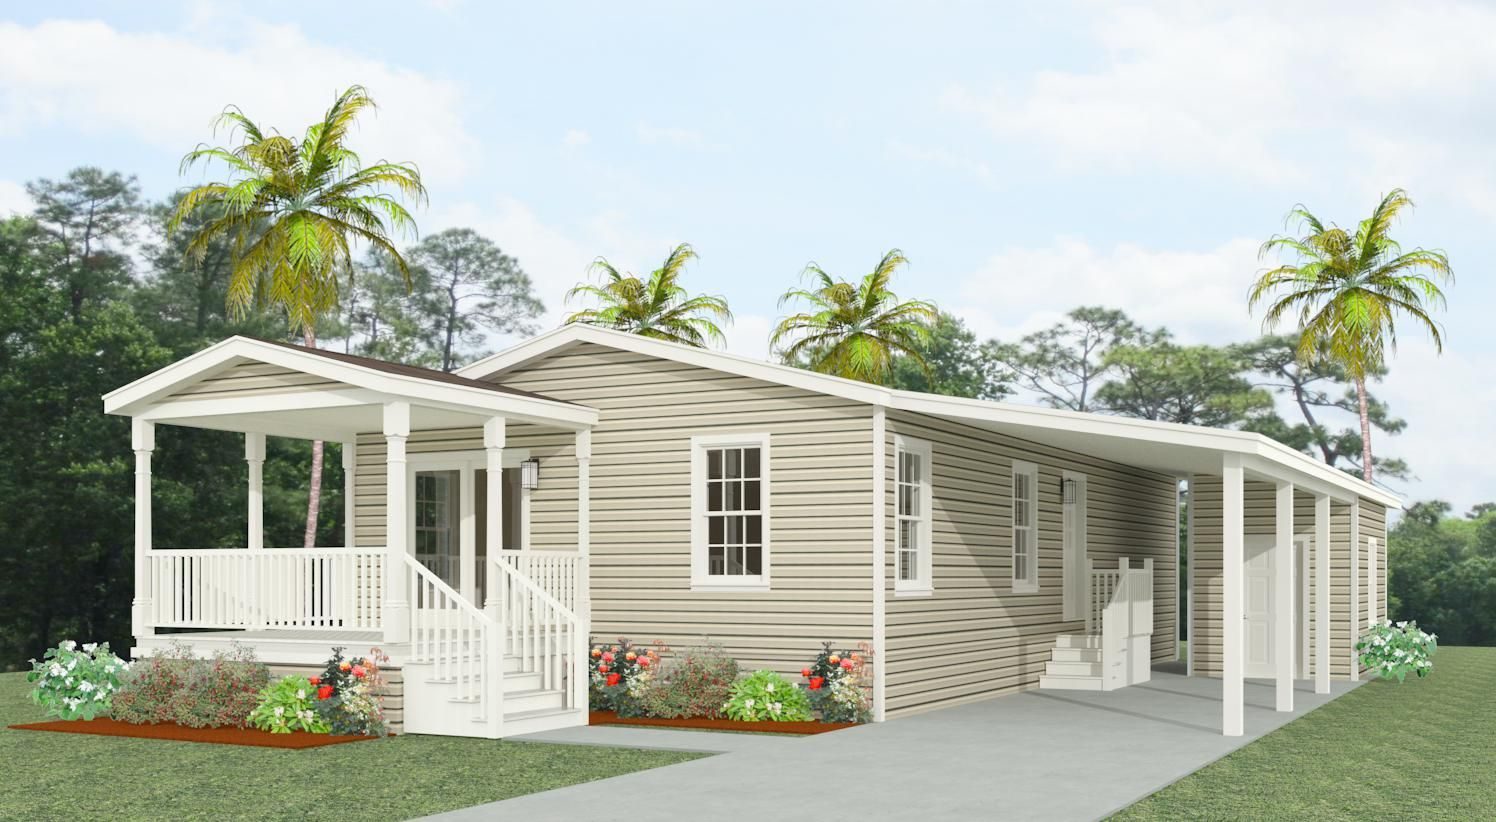 Jacobsen Homes Manufactured Home Model Center Modular Home Manufactured Homes Floor Plans Manufactured Home Porch Manufactured Home